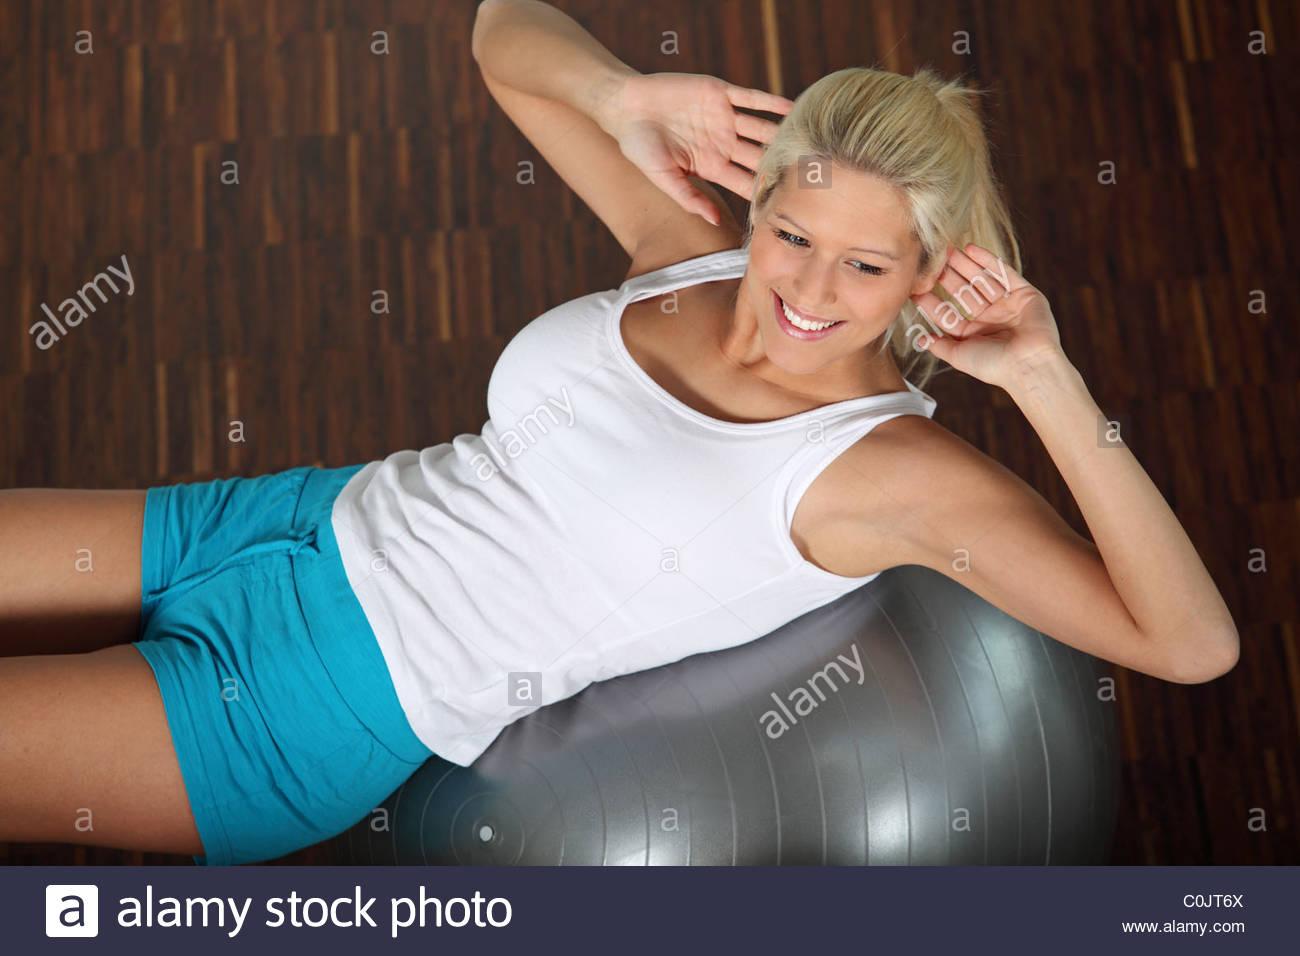 blond woman doing gymnastics on the floor - Stock Image